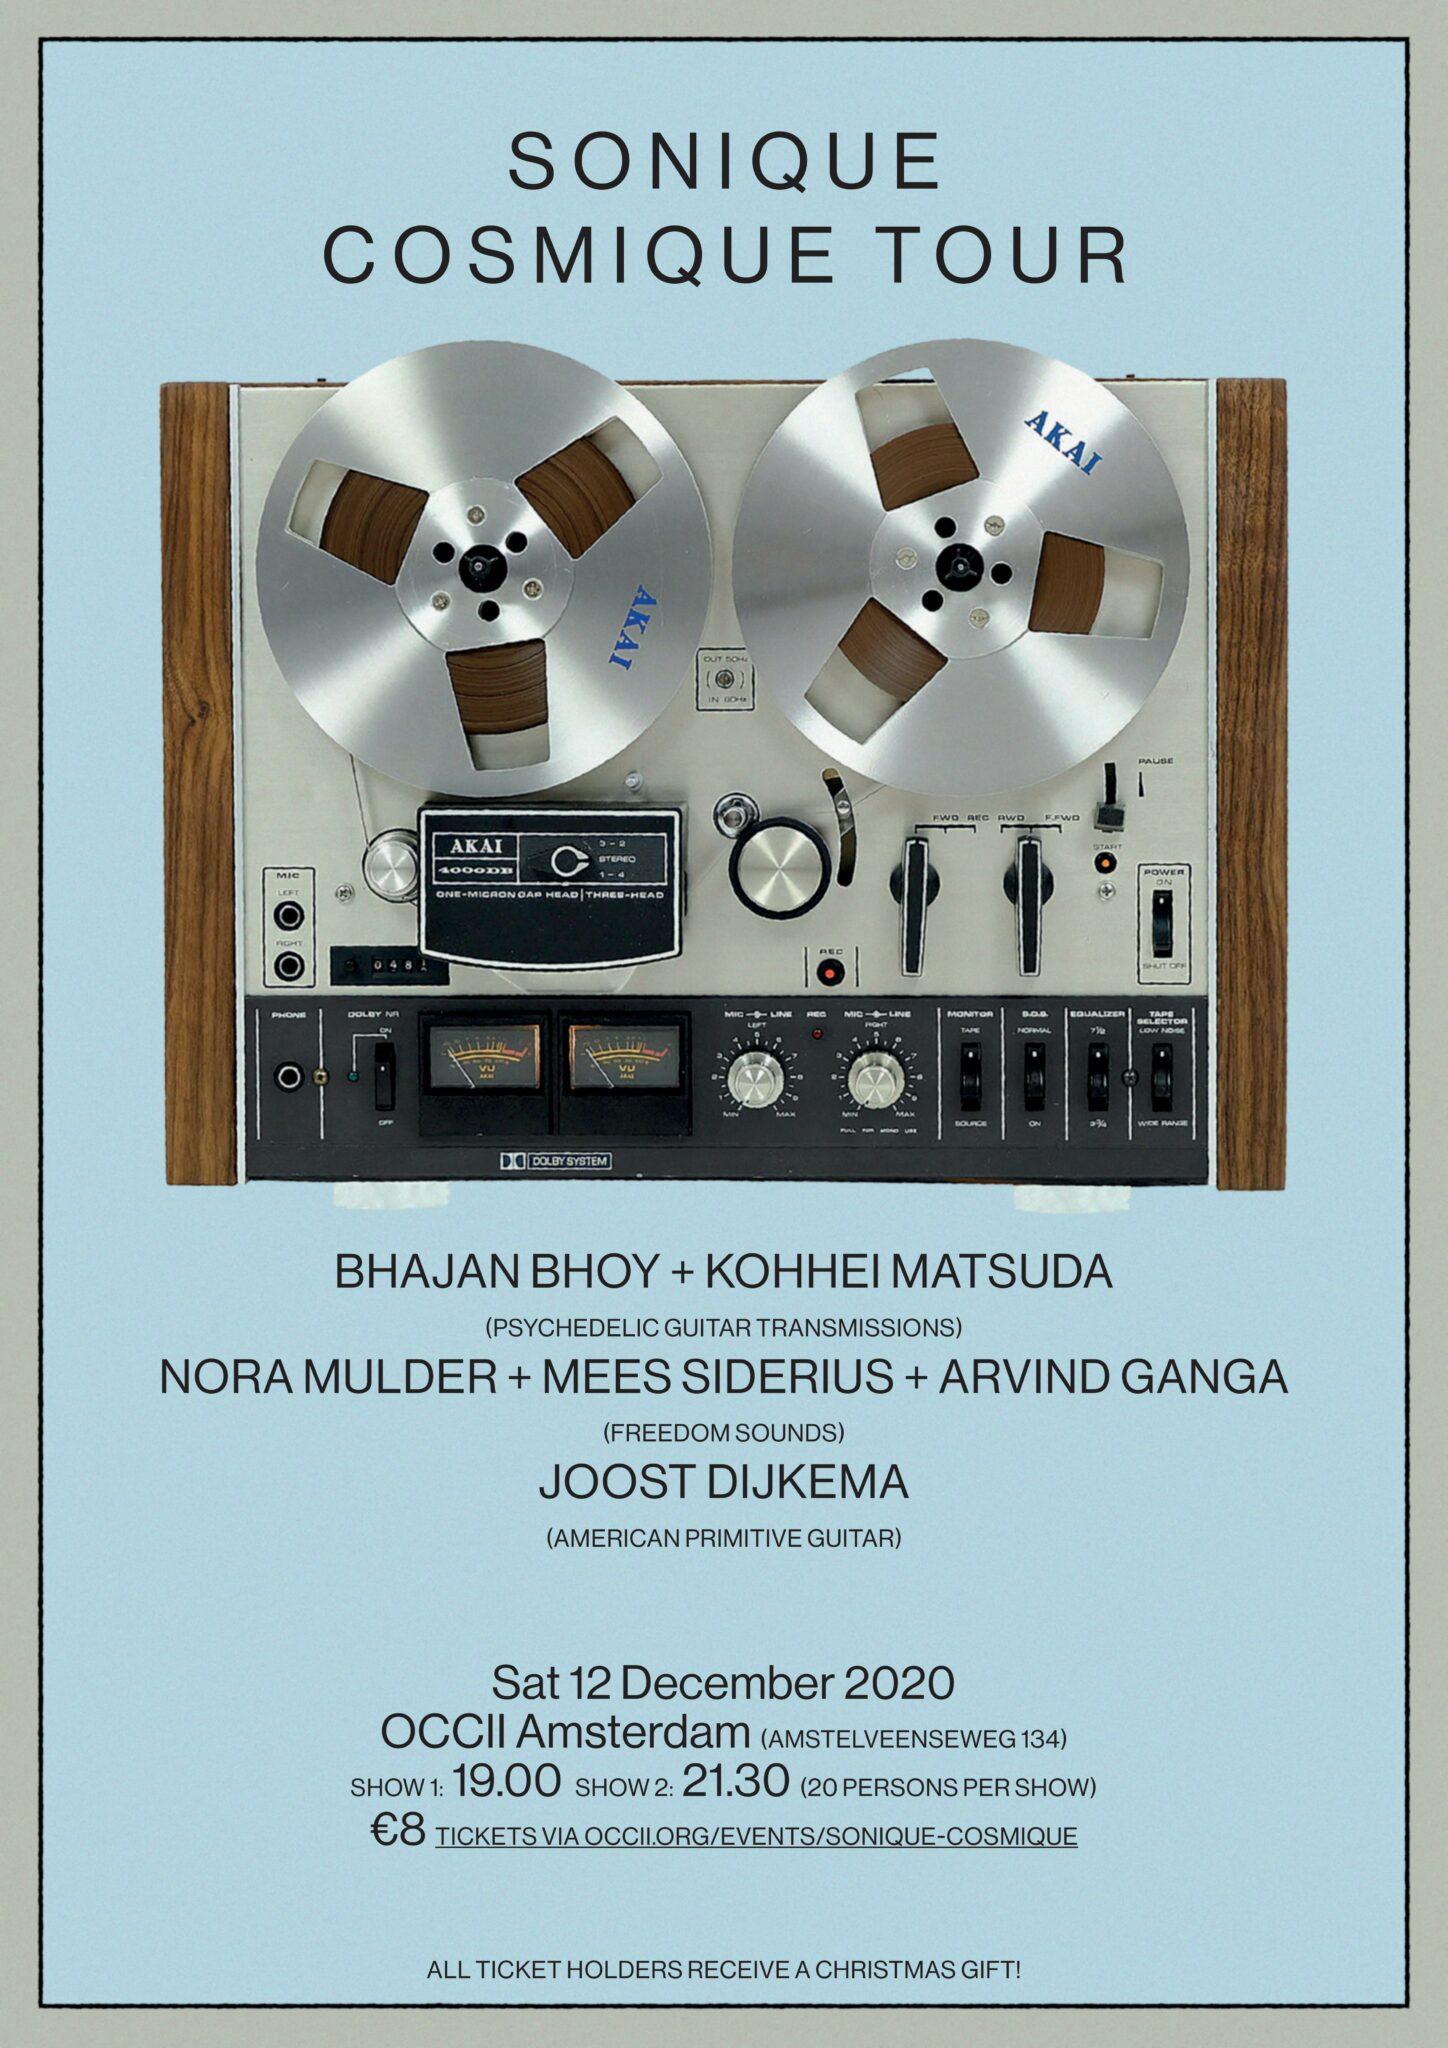 BHAJAN BHOY & KOHHEI MATSUDA (BoNingen, JP) + NORA MULDER, ARVIND GANGA & MEES SIDERIUS + JOOST DIJKEMA